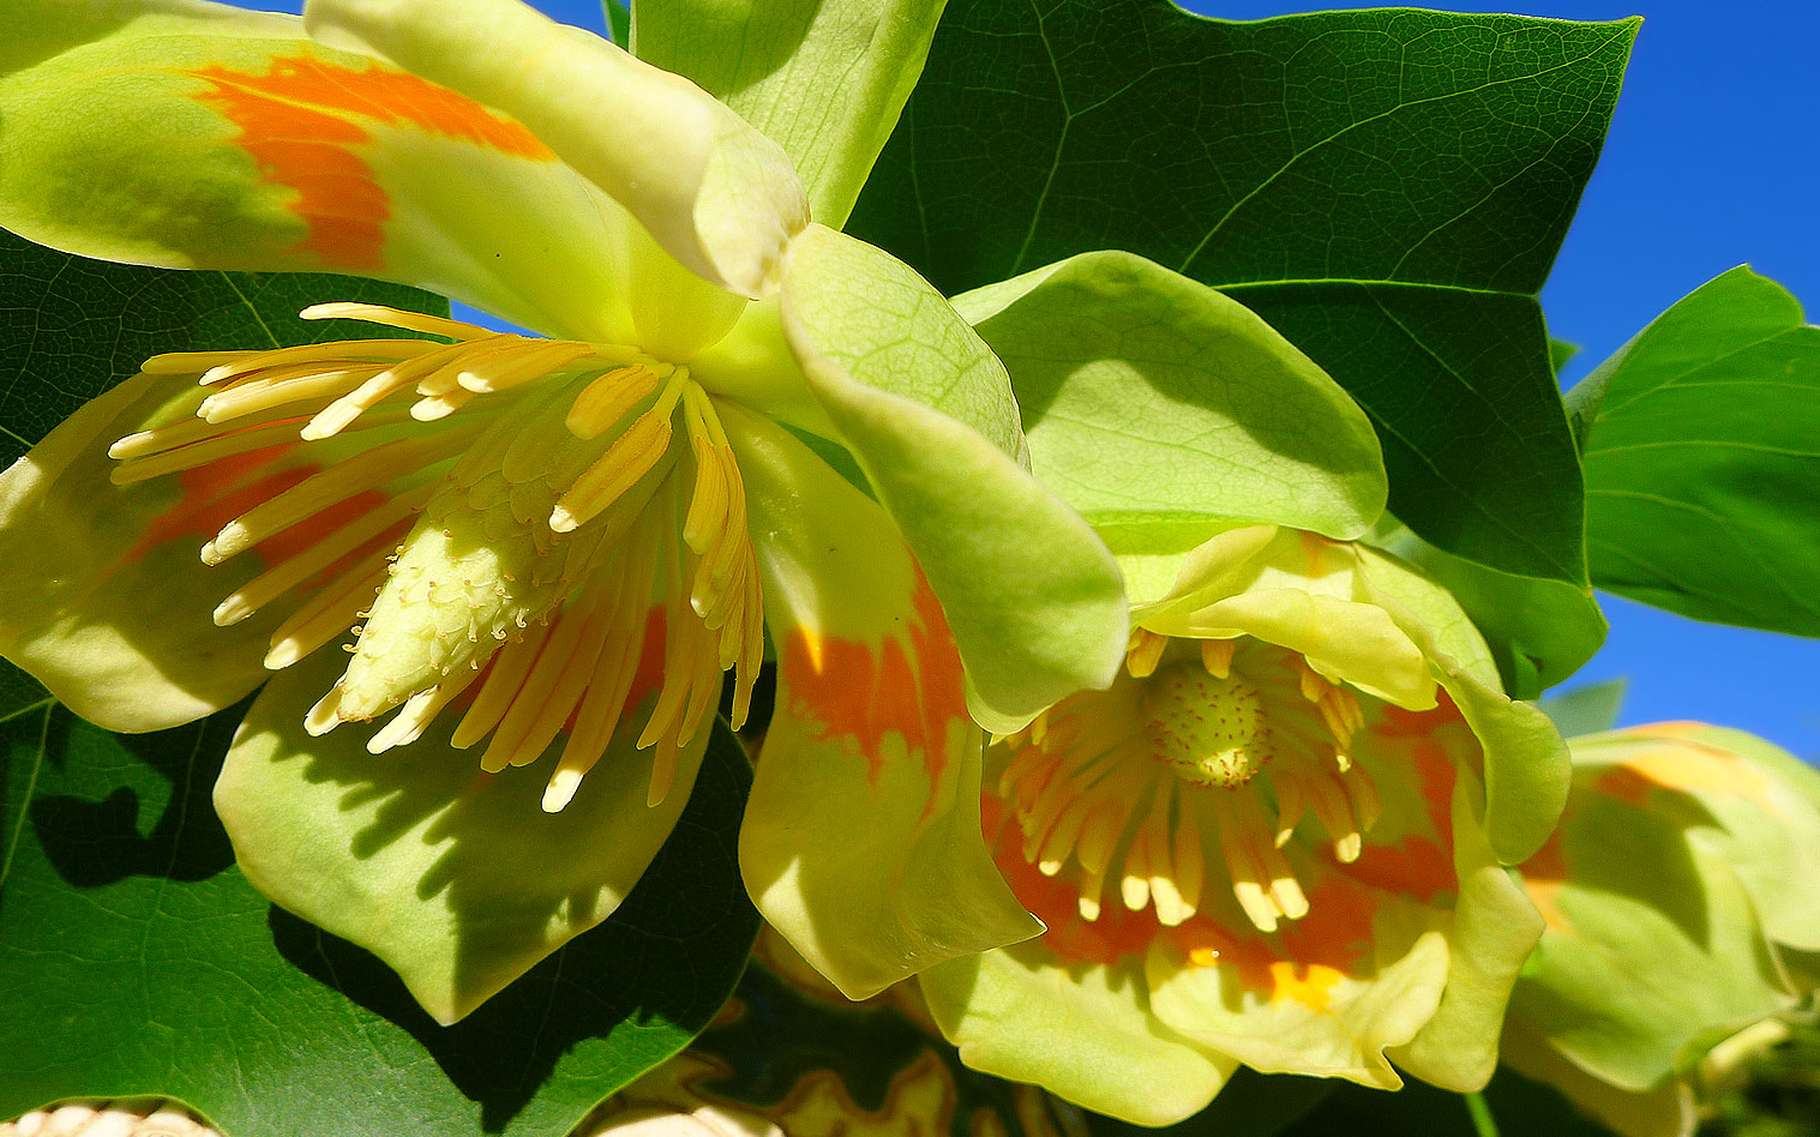 Meise (Belgique), Jardin national botanique de Belgique - Liriodendron tulipifera - Tulipier de Virginie. © Jean-Pol Grandmont, Creative Commons Attribution-Share Alike 2.5 Generic license